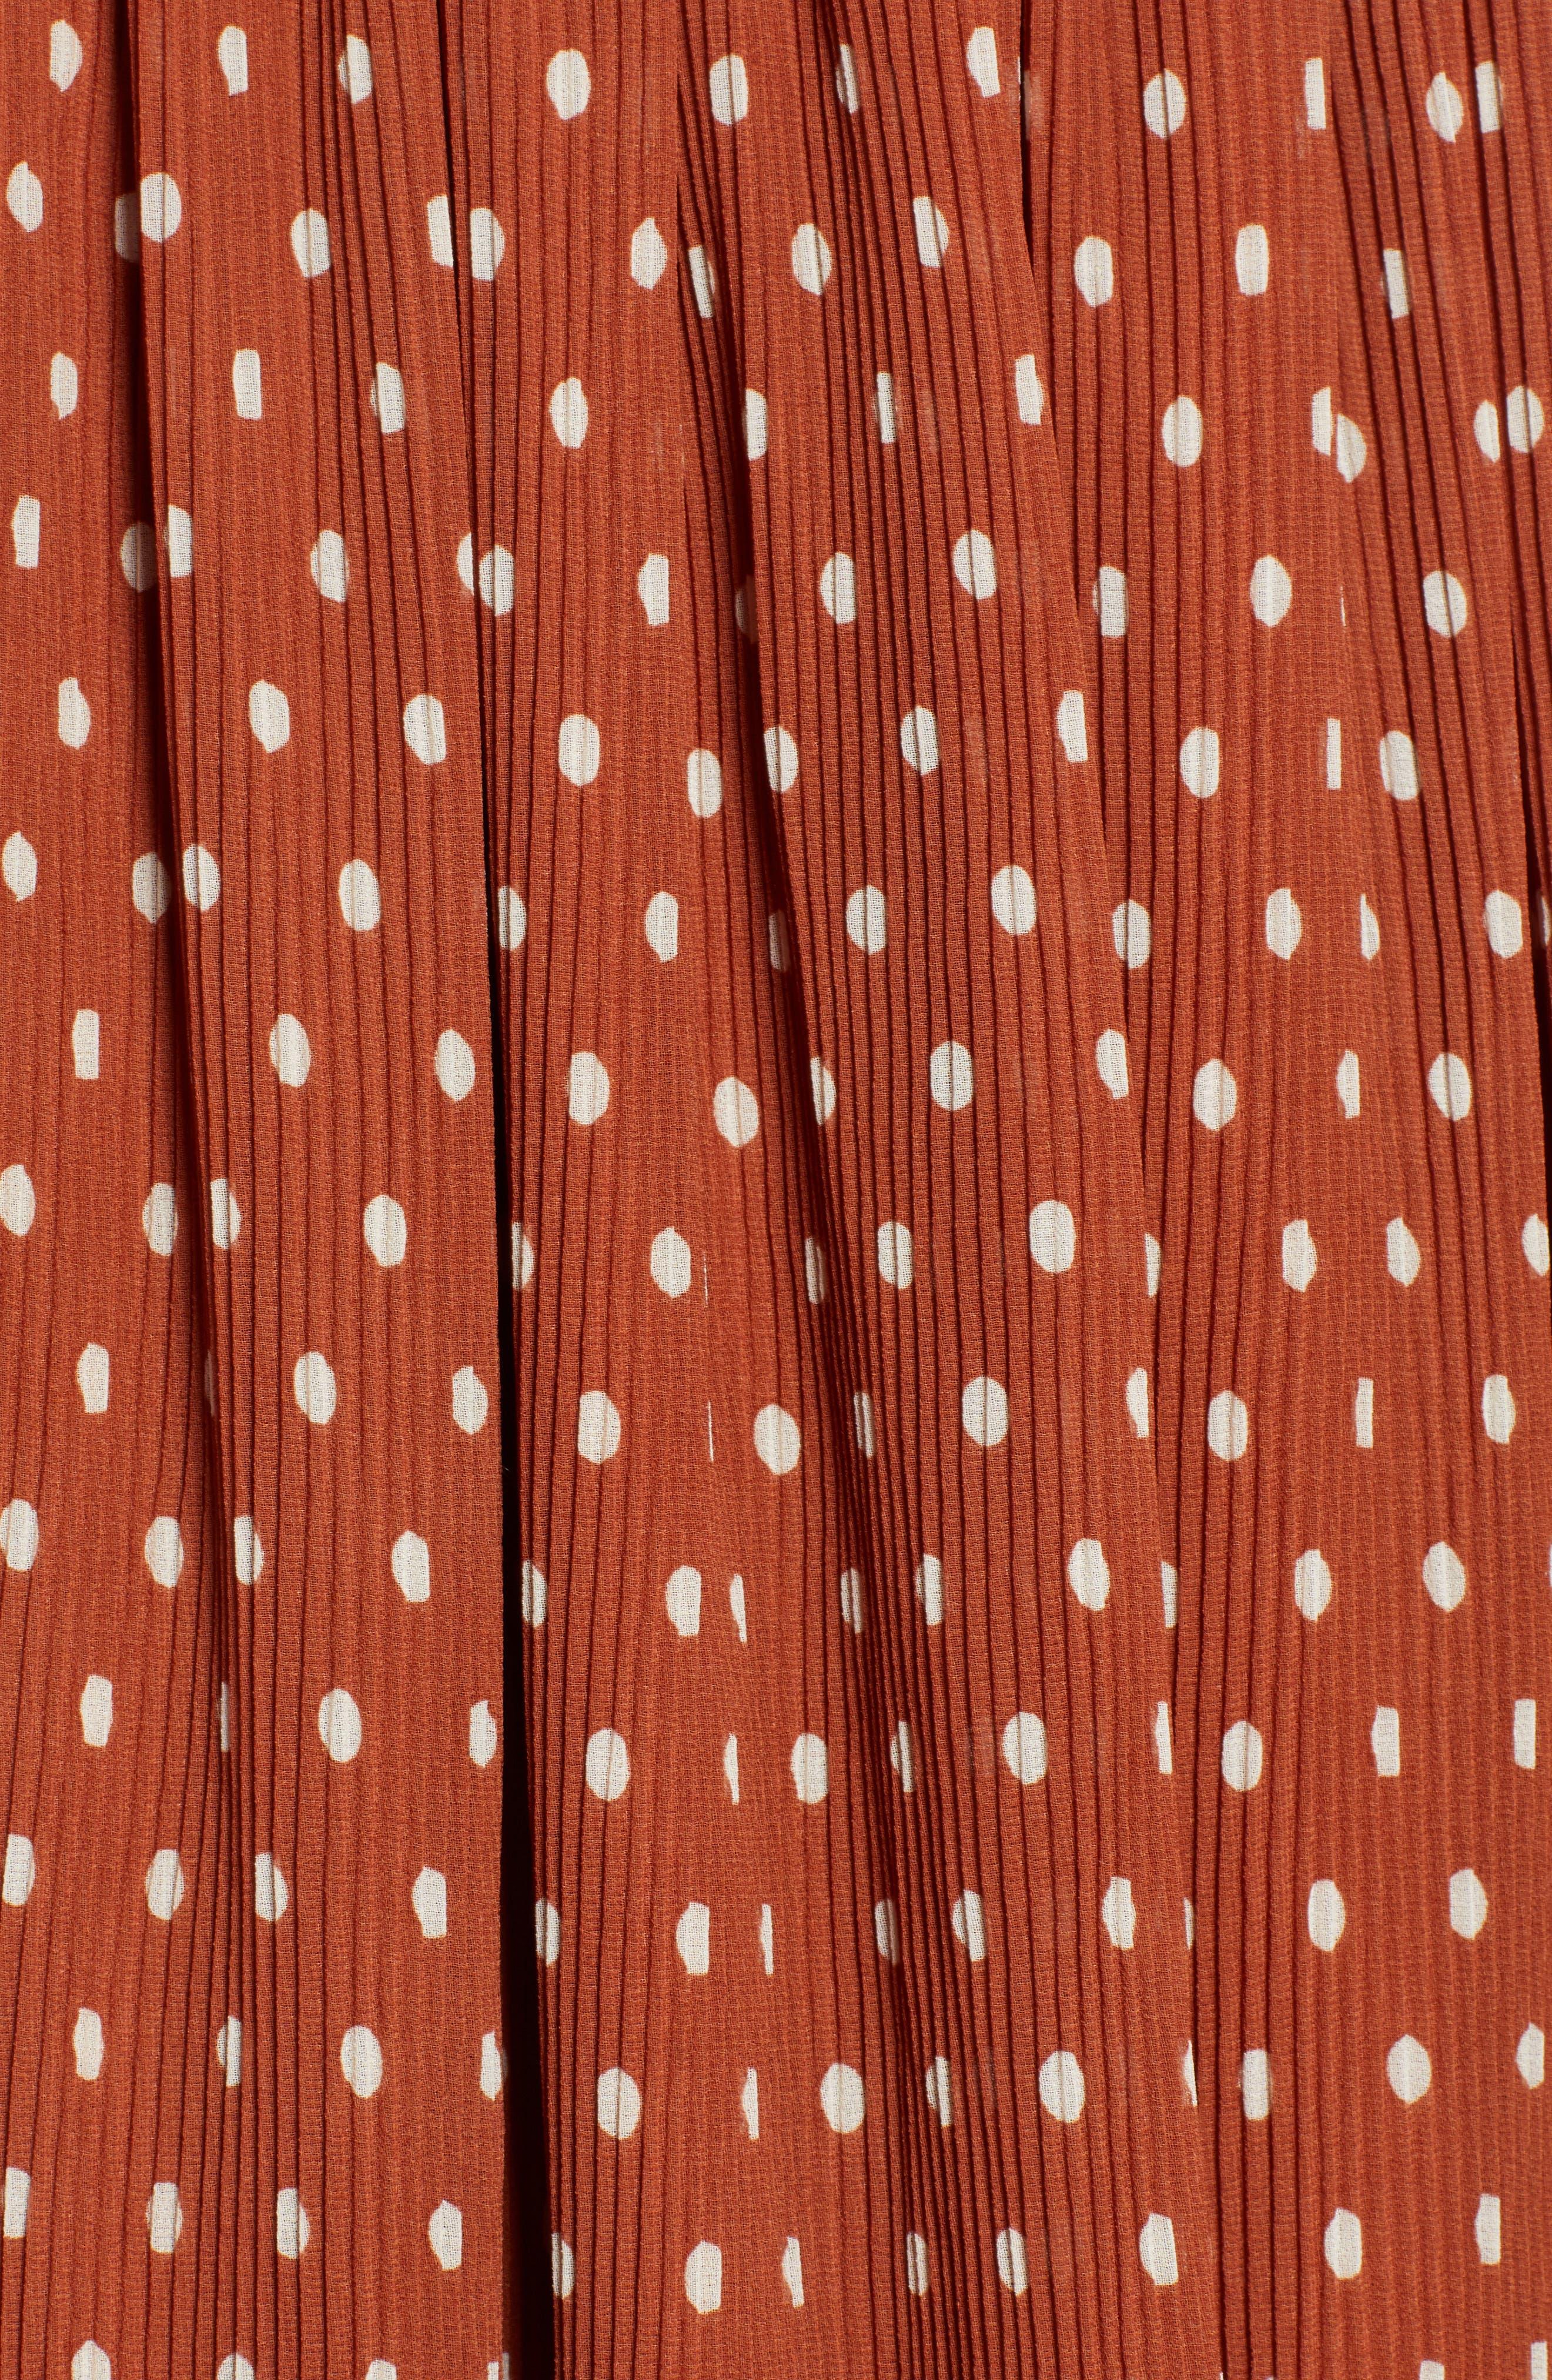 x Atlantic-Pacific Crinkle Midi Skirt,                             Alternate thumbnail 6, color,                             RUST SPACED DOT